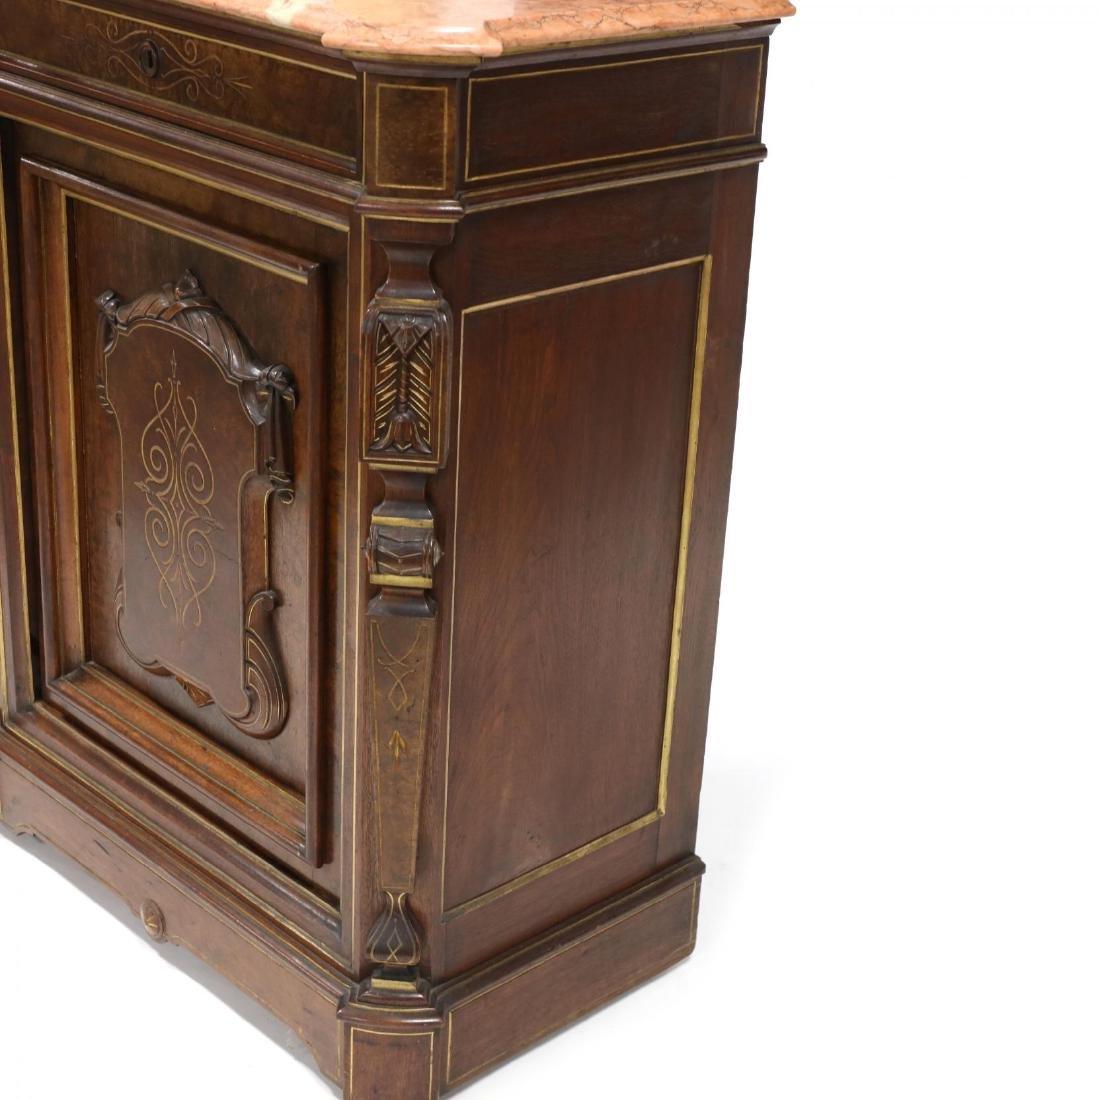 American Renaissance Revival Marble Top Cabinet - 5